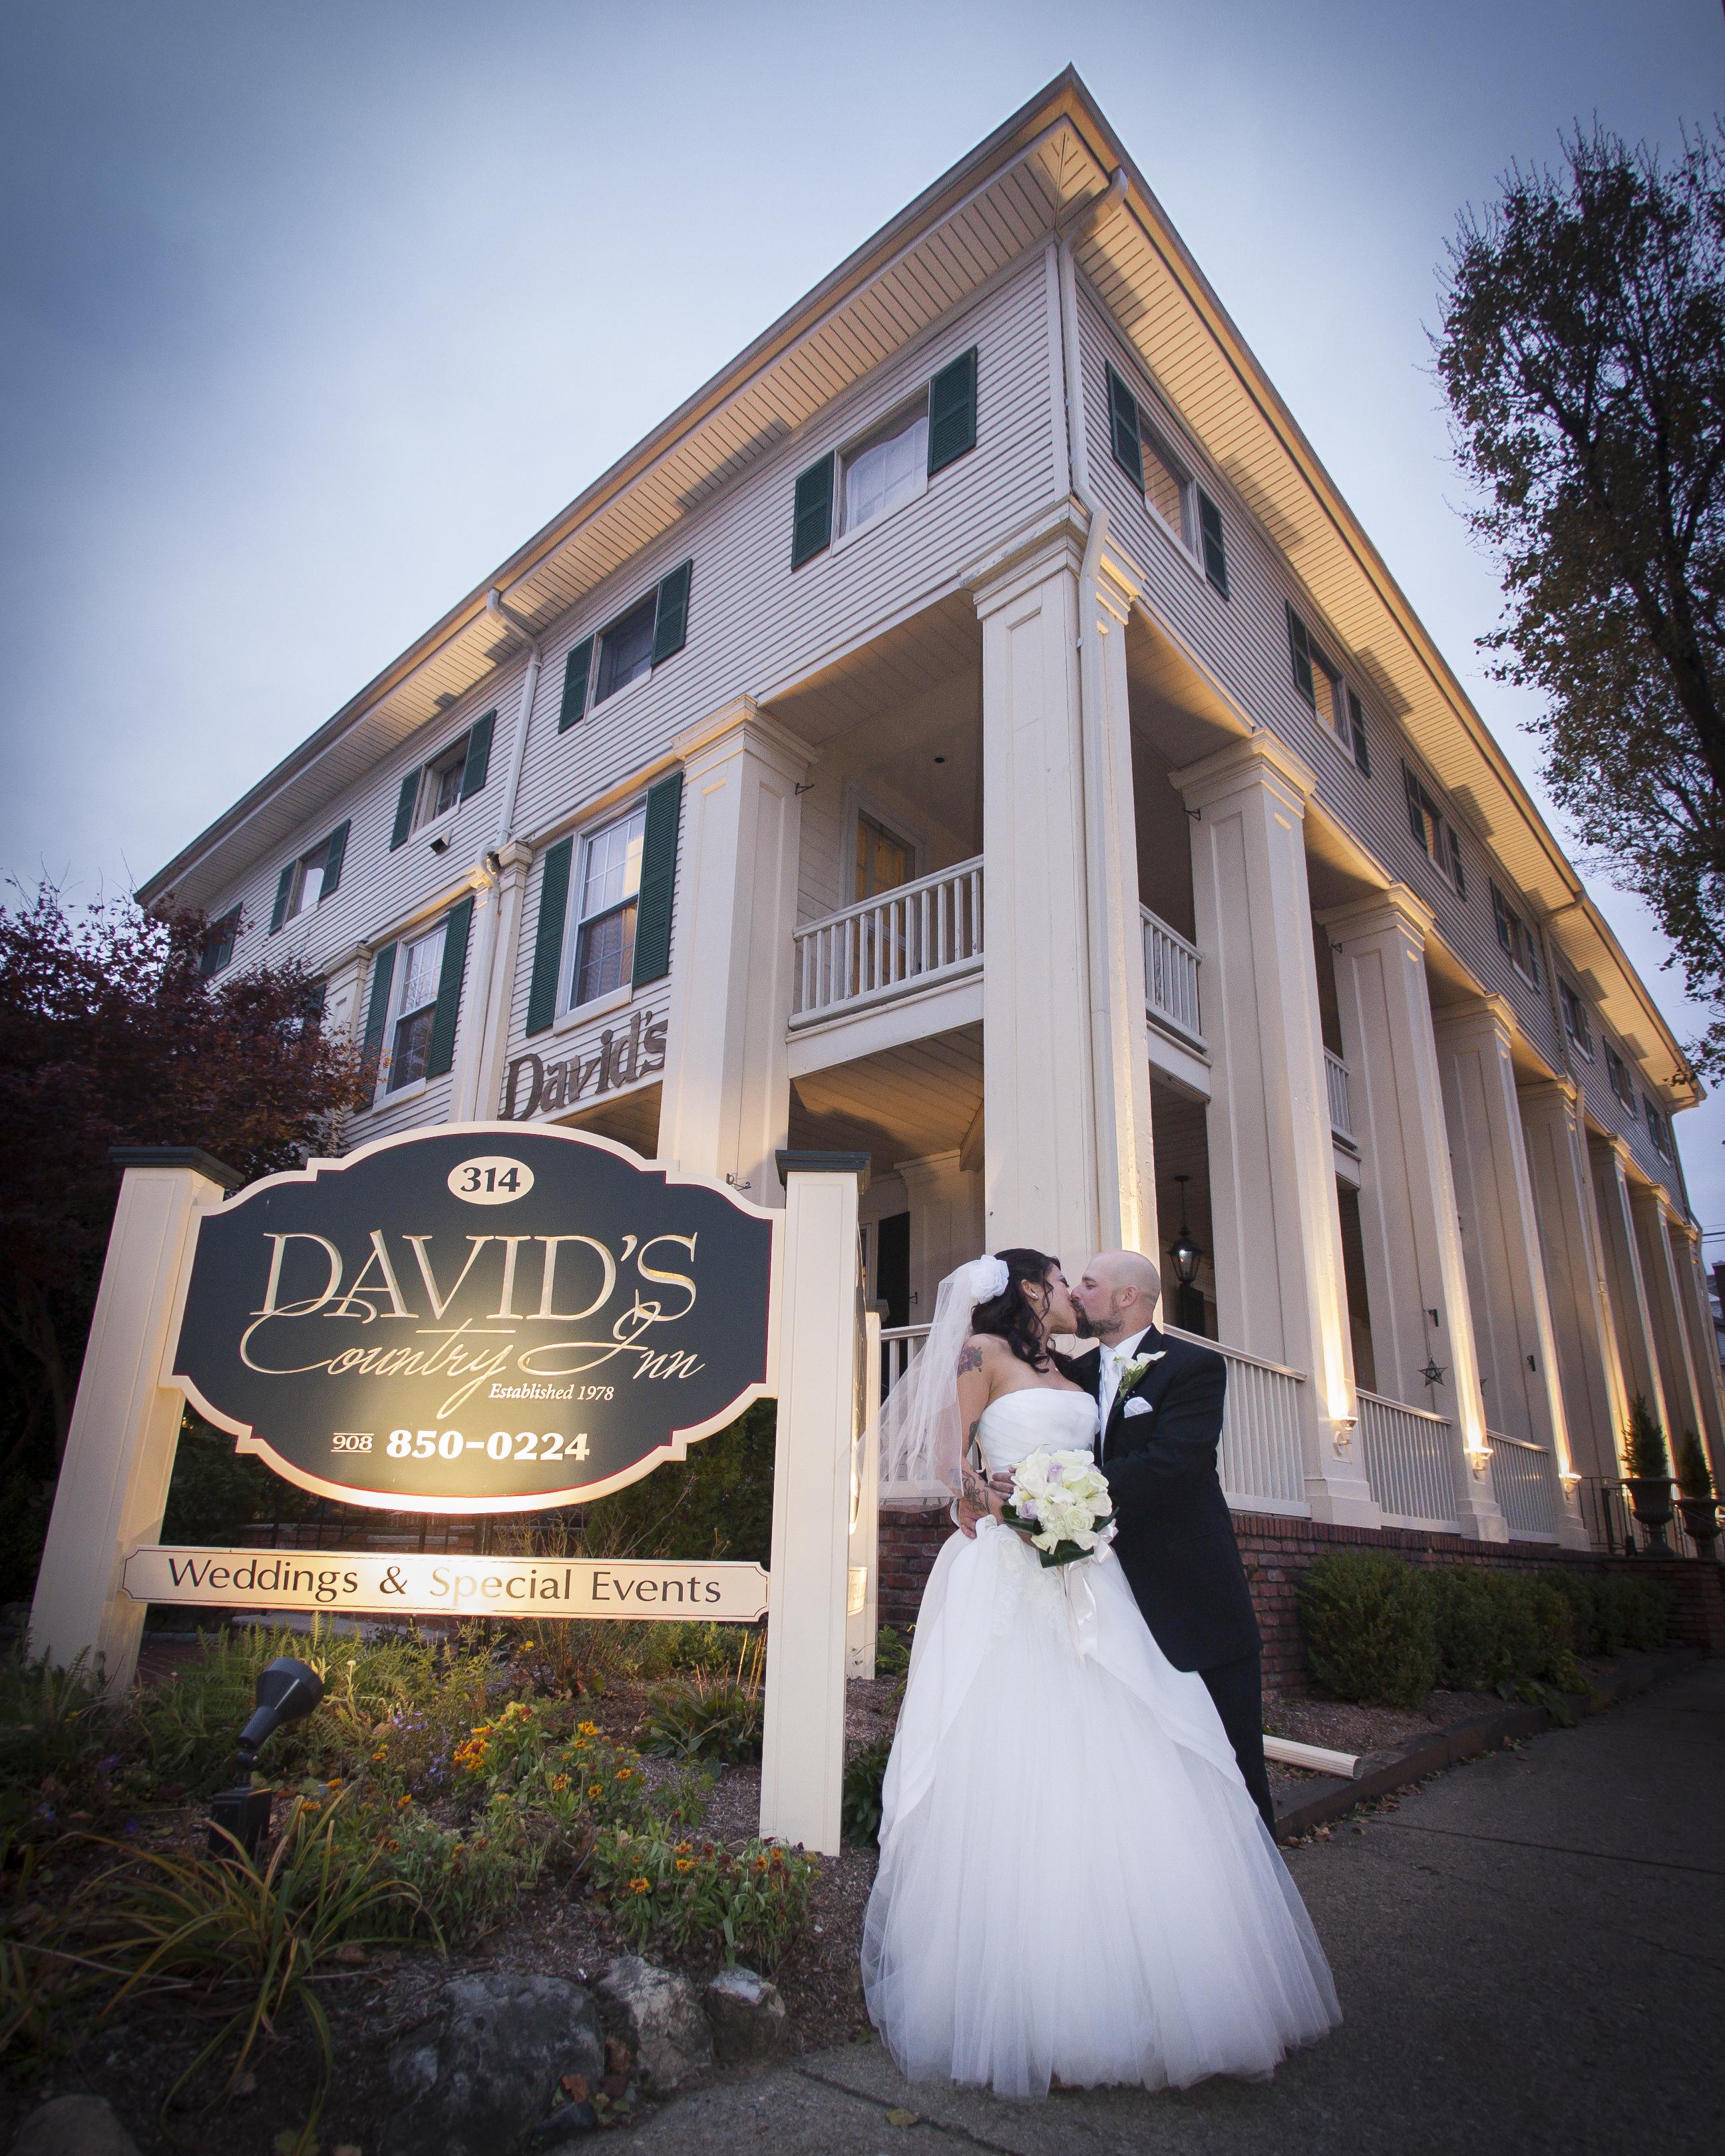 Outdoor Wedding Venues Nj: Davids Country Inn Wedding Venue In New Jersey